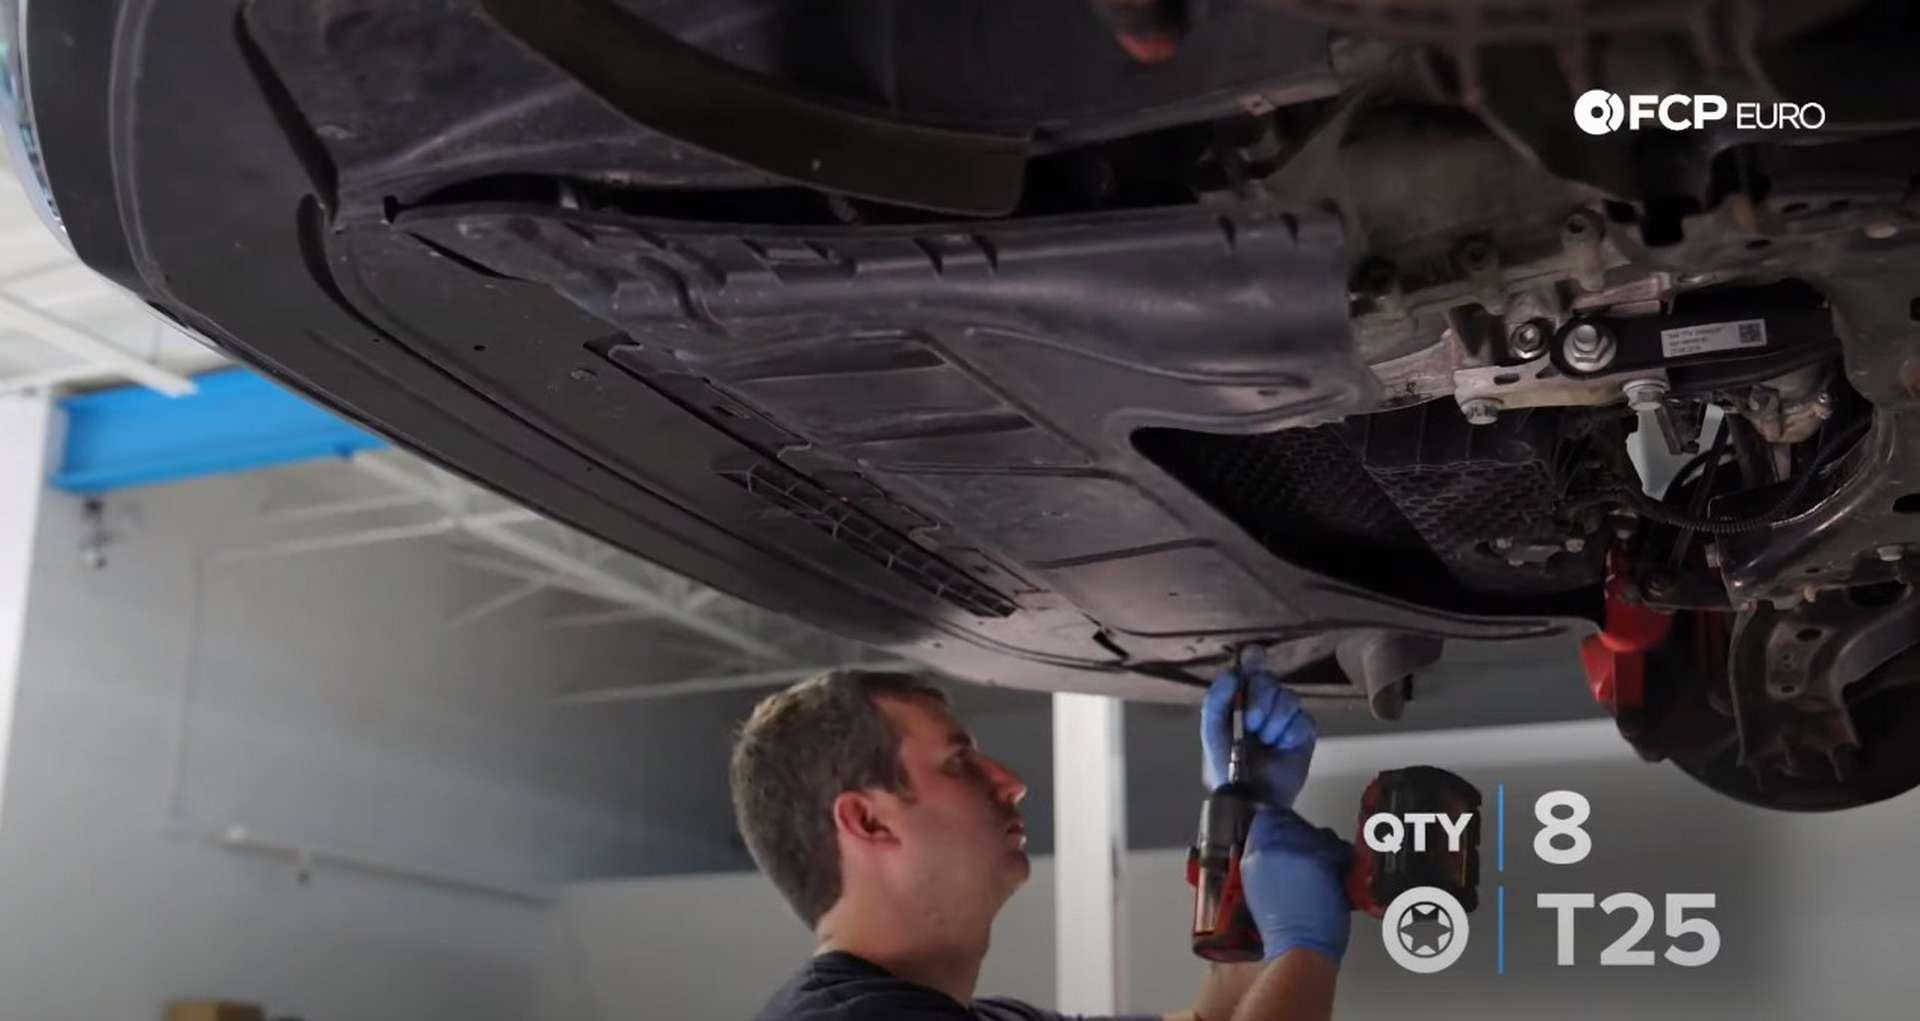 17-DIY_VW_GTI_Clutch-Job-Draining-Fluids